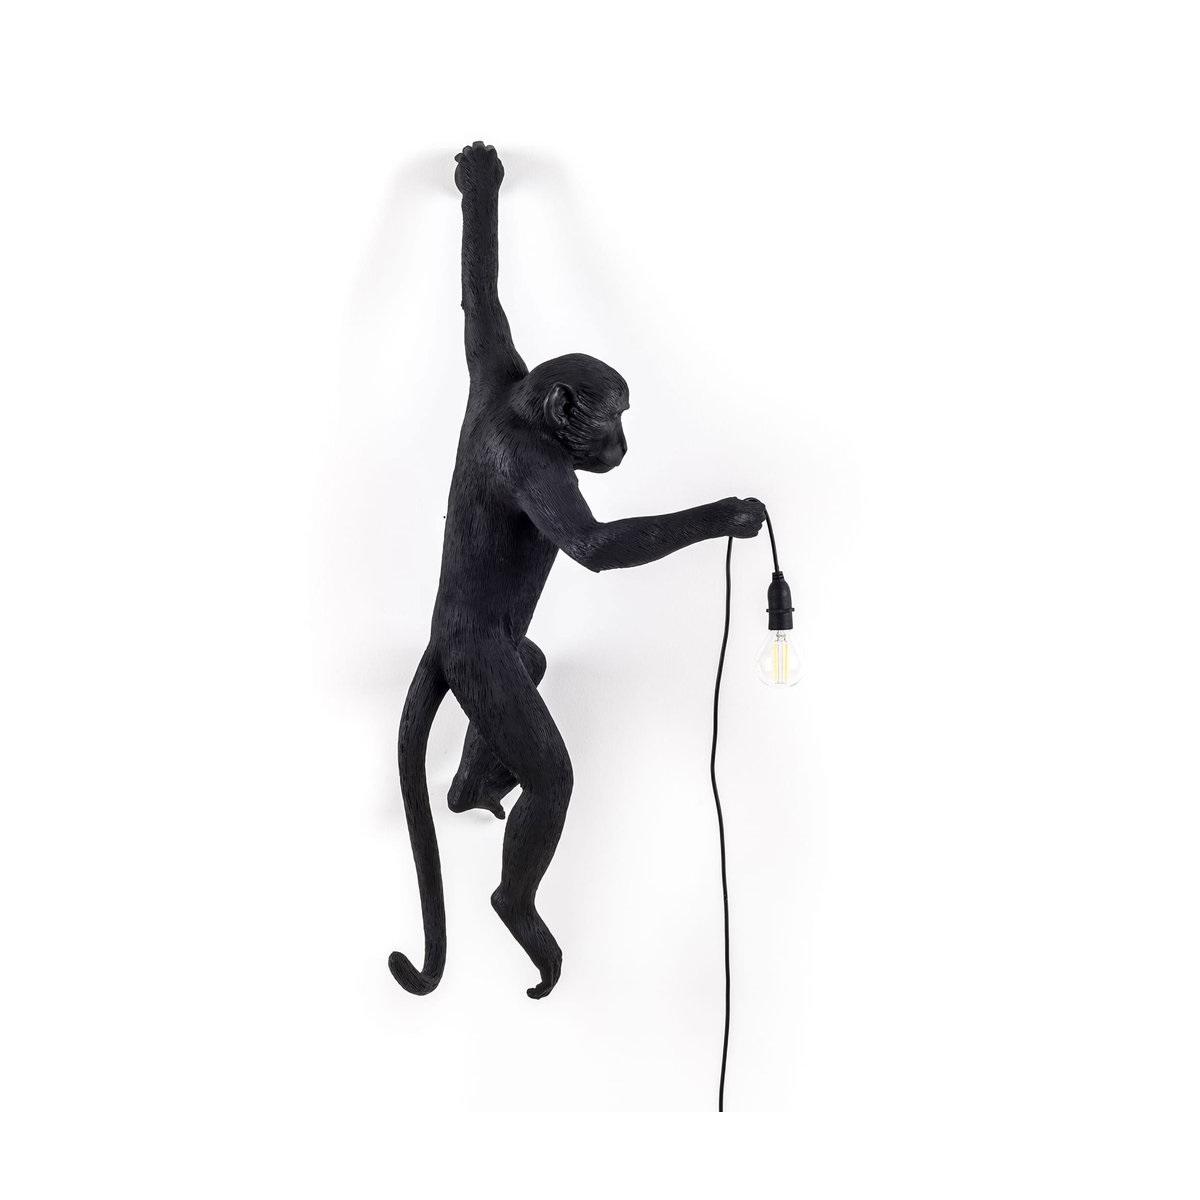 Aplampa Utomhus Monkey Lamp Outdoor, Seletti